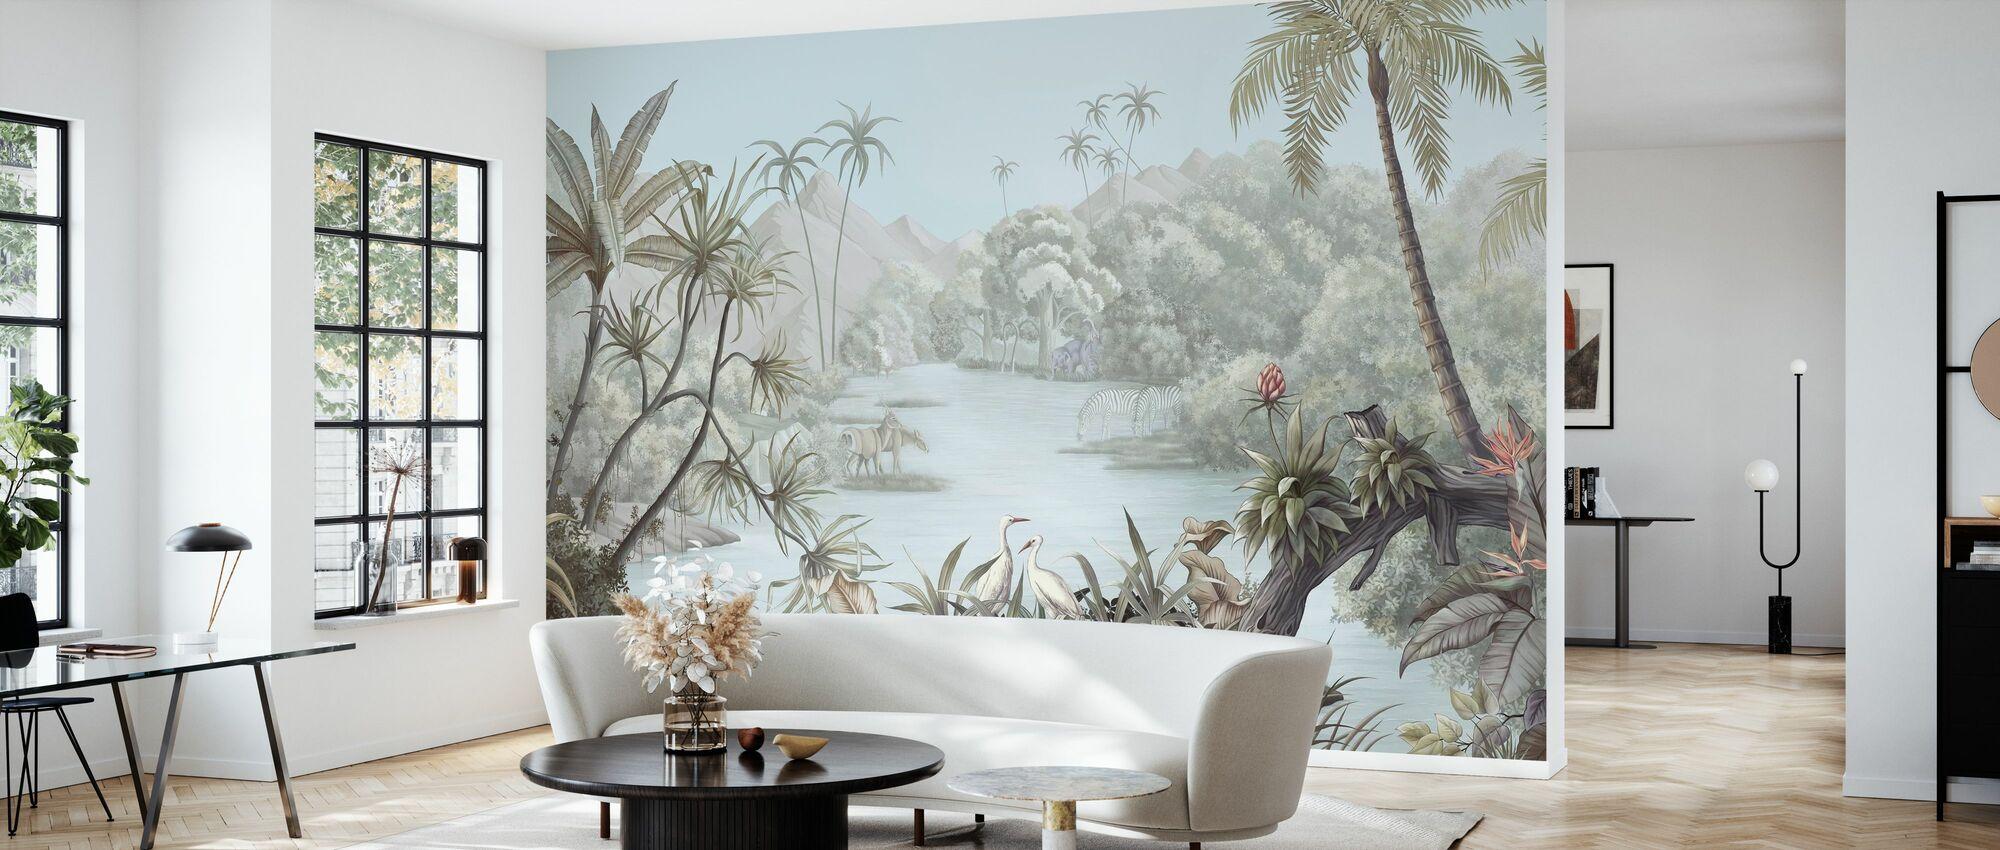 Tangled Jungle II - Wallpaper - Living Room